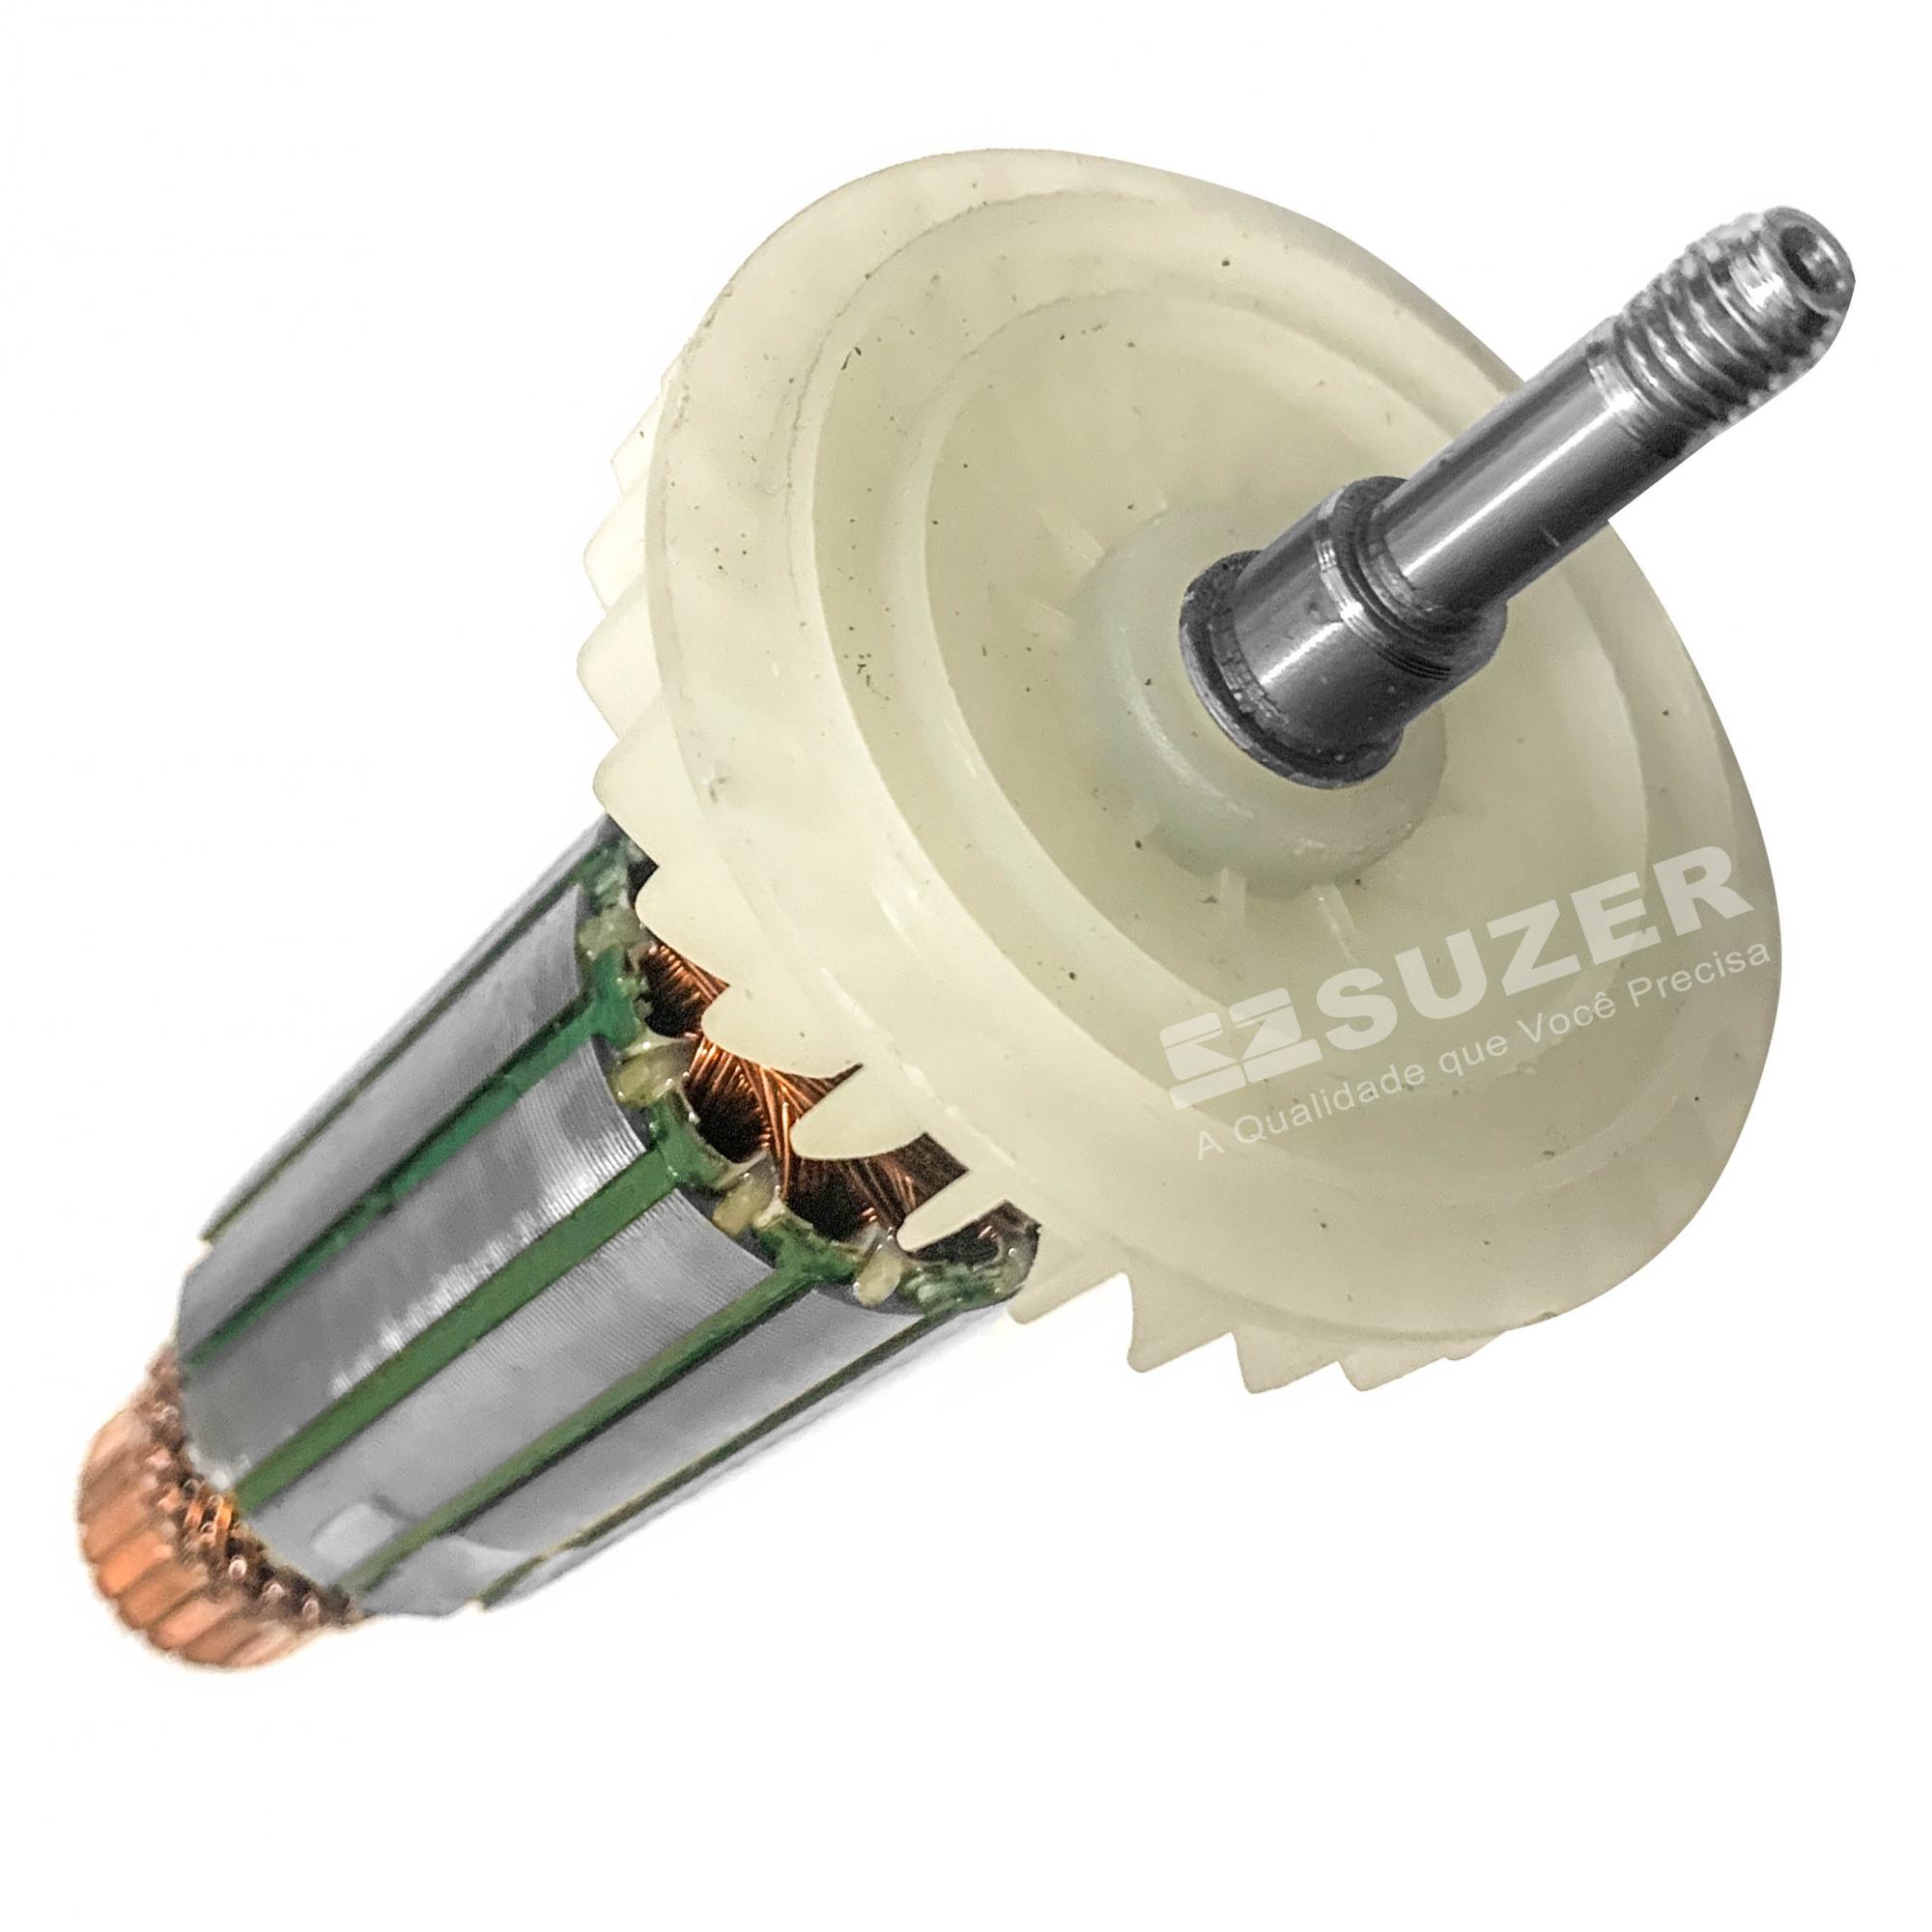 "Induzido (Rotor) para esmerilhadeira makita 9557 4 1/2"" 165mm"